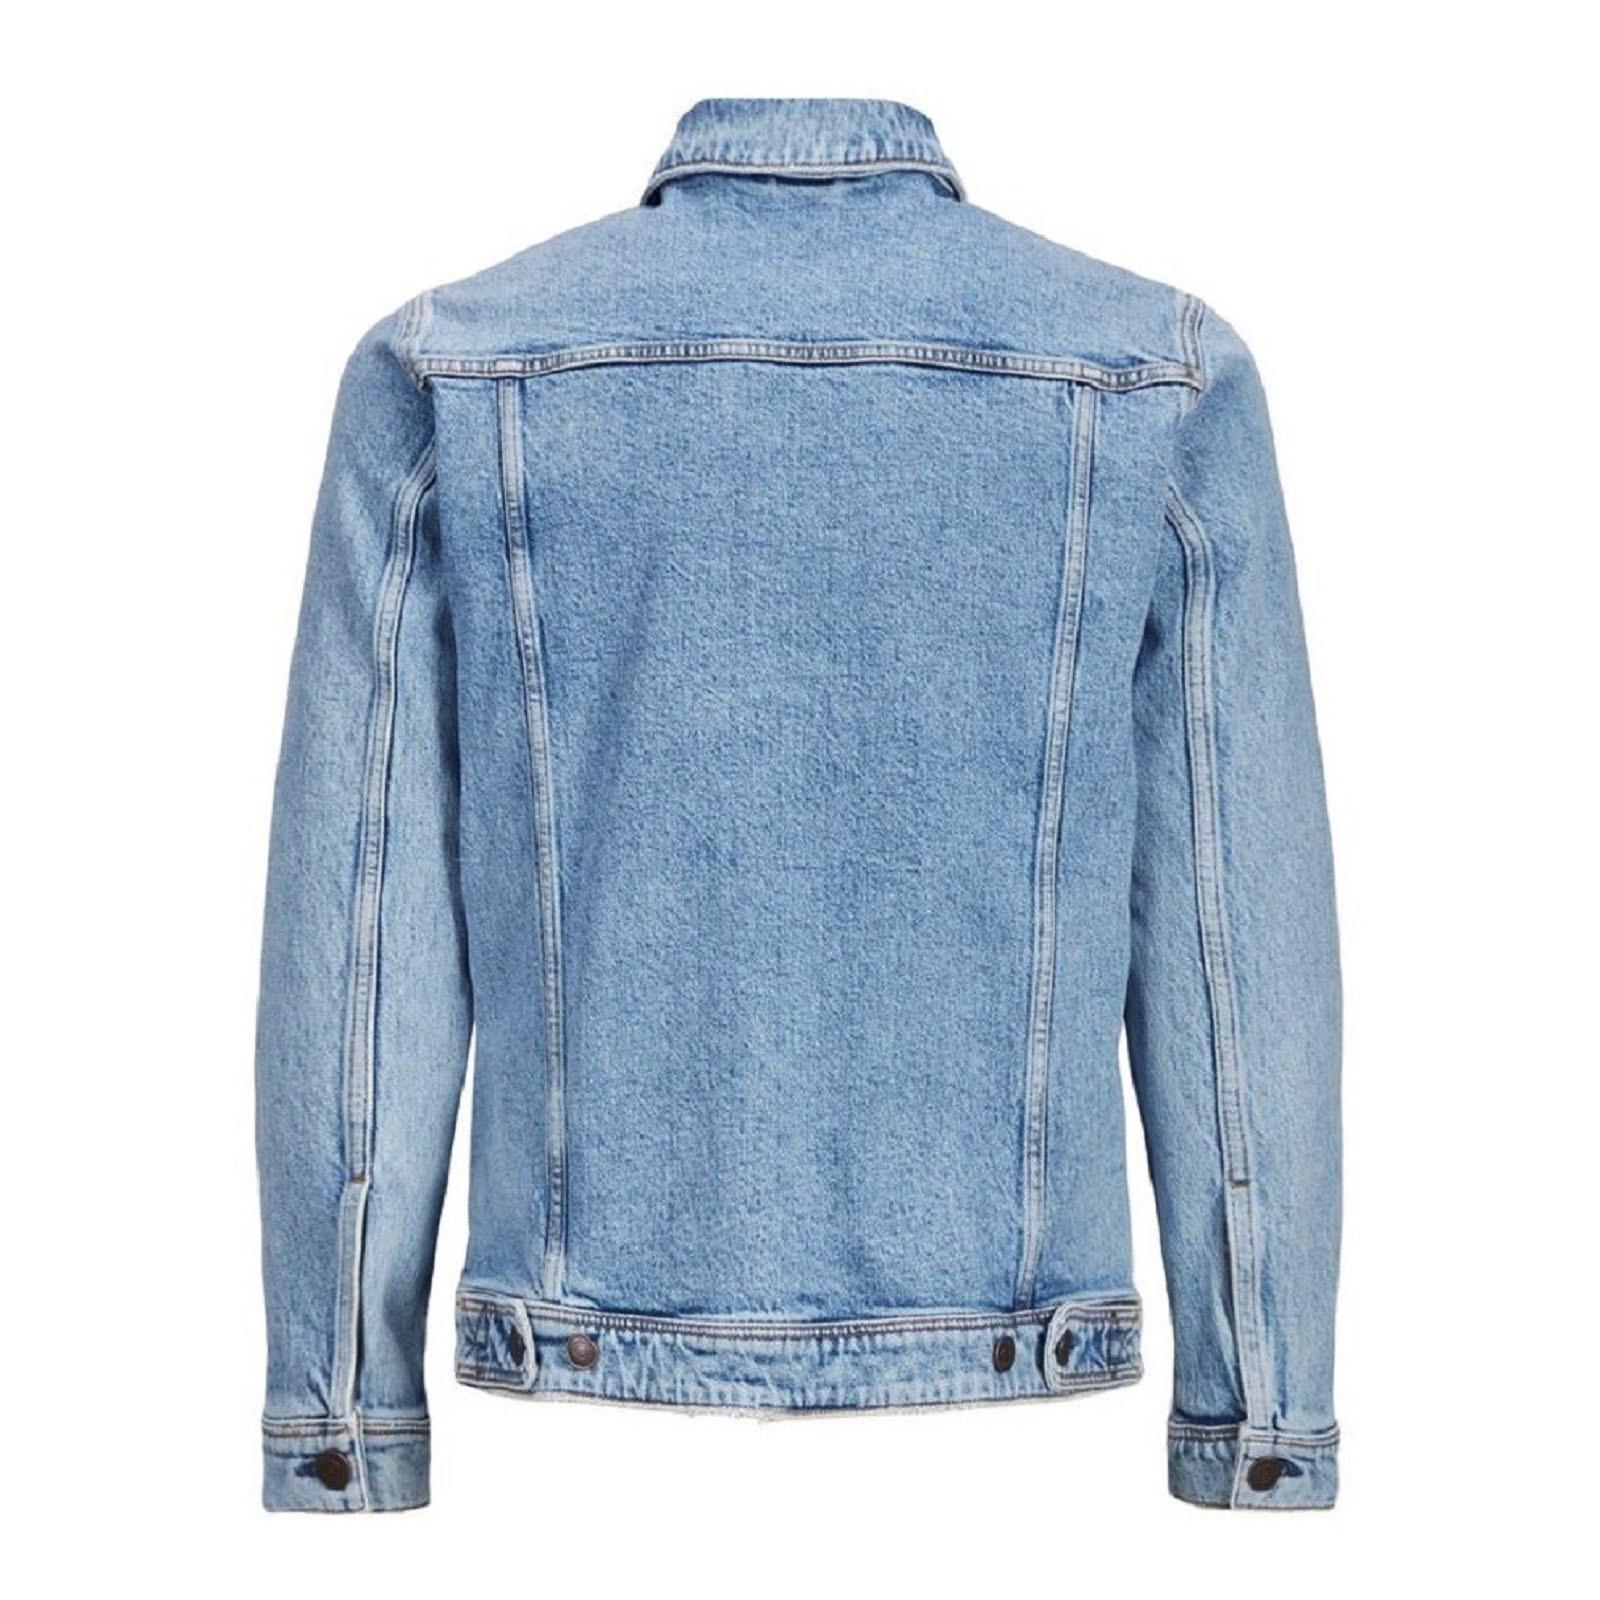 Giubbino-Jeans-Uomo-Giacca-Denim-Casual-Giacca-Slim-Fit-Blu-Chiaro miniatura 9